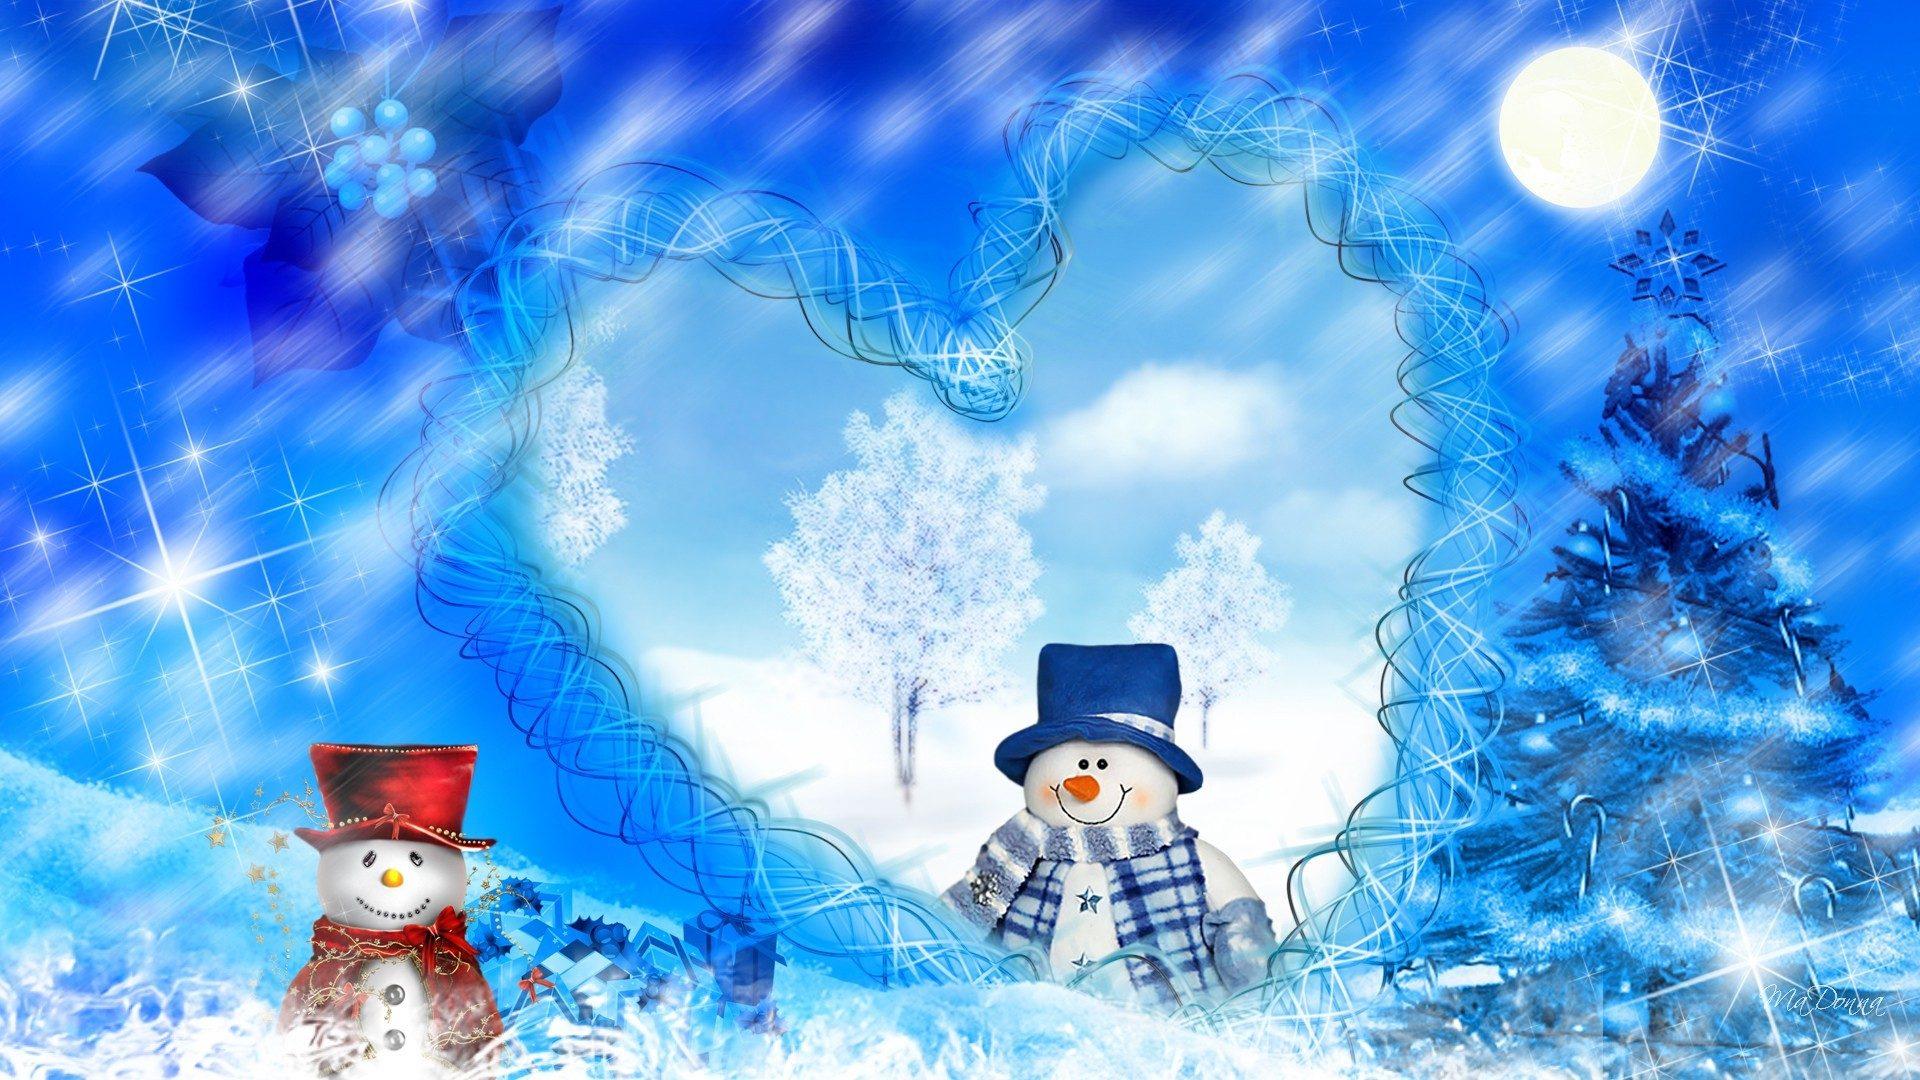 Winter Wallpaper HD Download 1920x1080